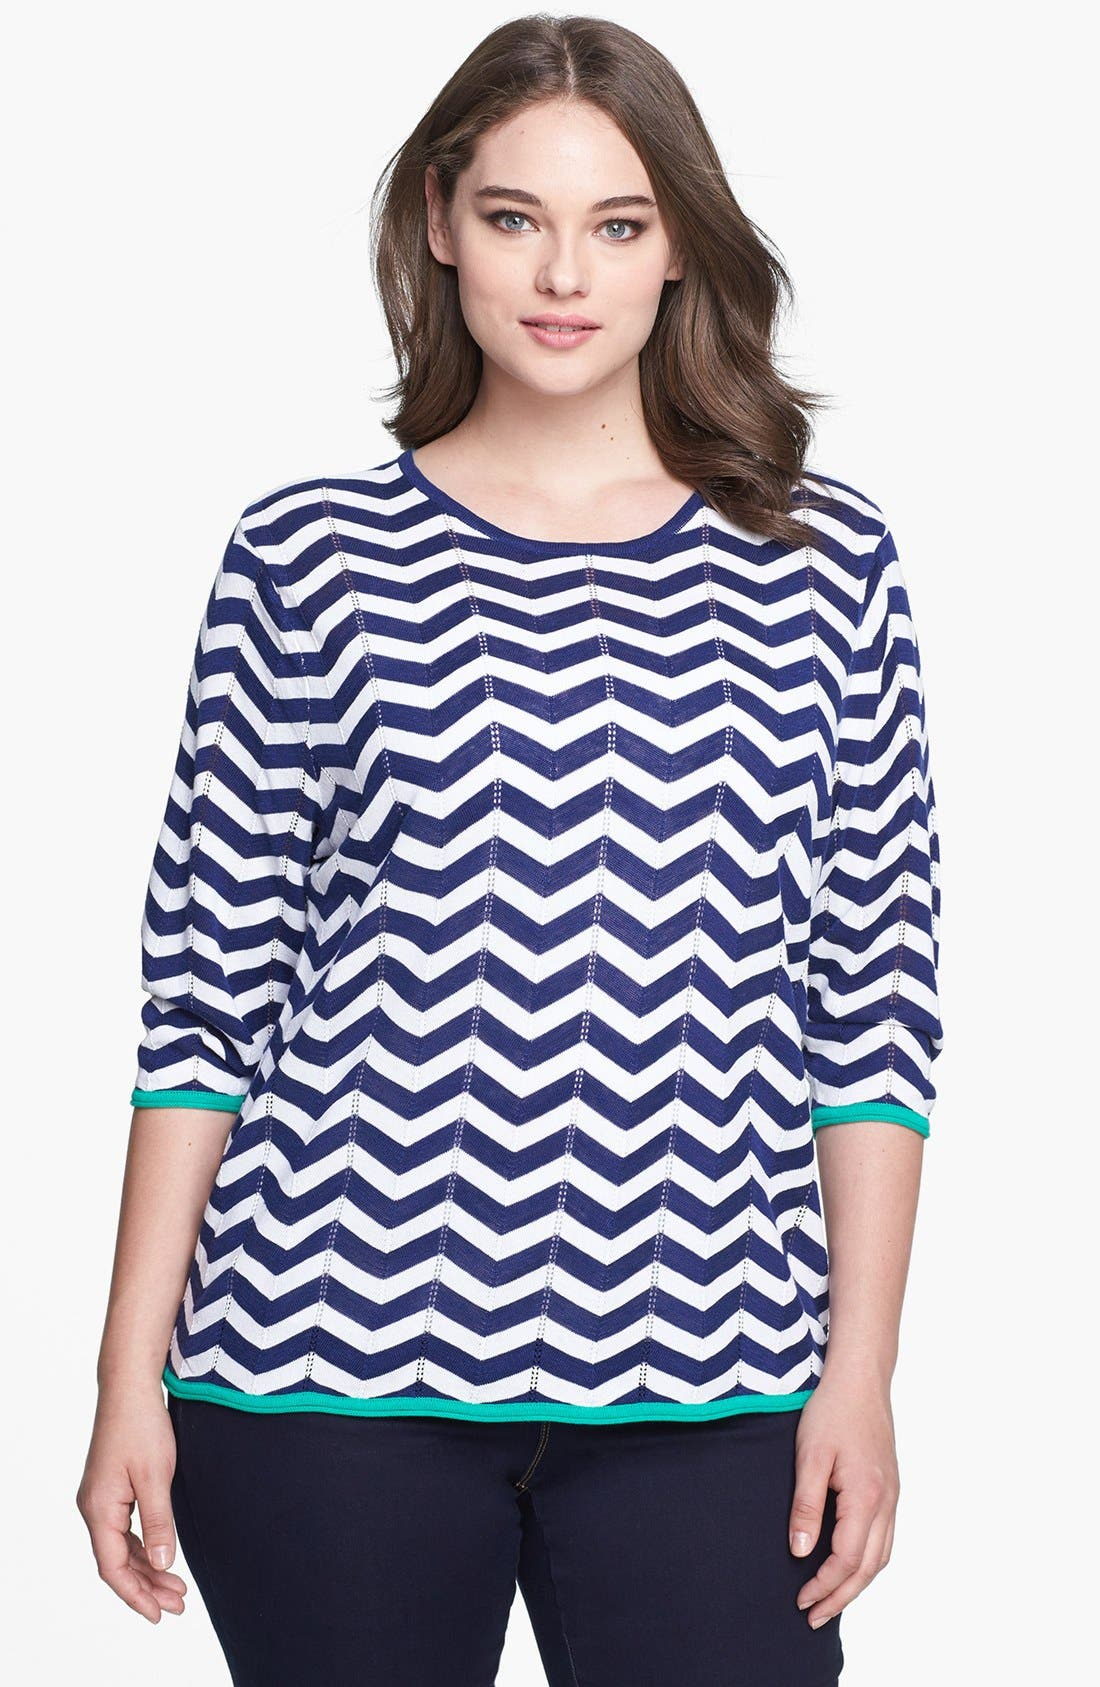 Alternate Image 1 Selected - Foxcroft Chevron Stripe Pullover Sweater (Plus Size)